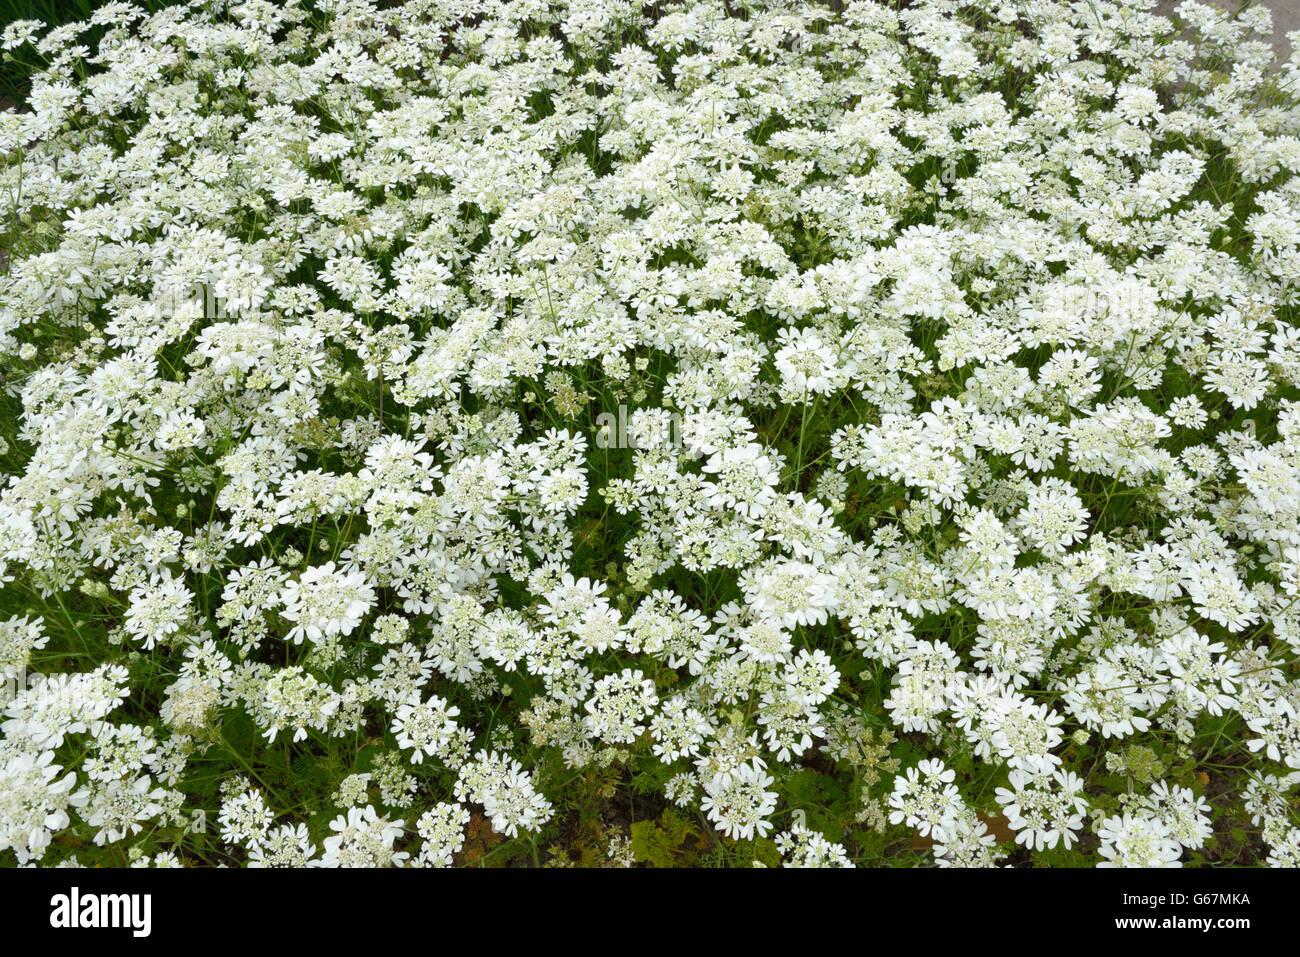 White lace flower / (Orlaya grandiflora) Stock Photo